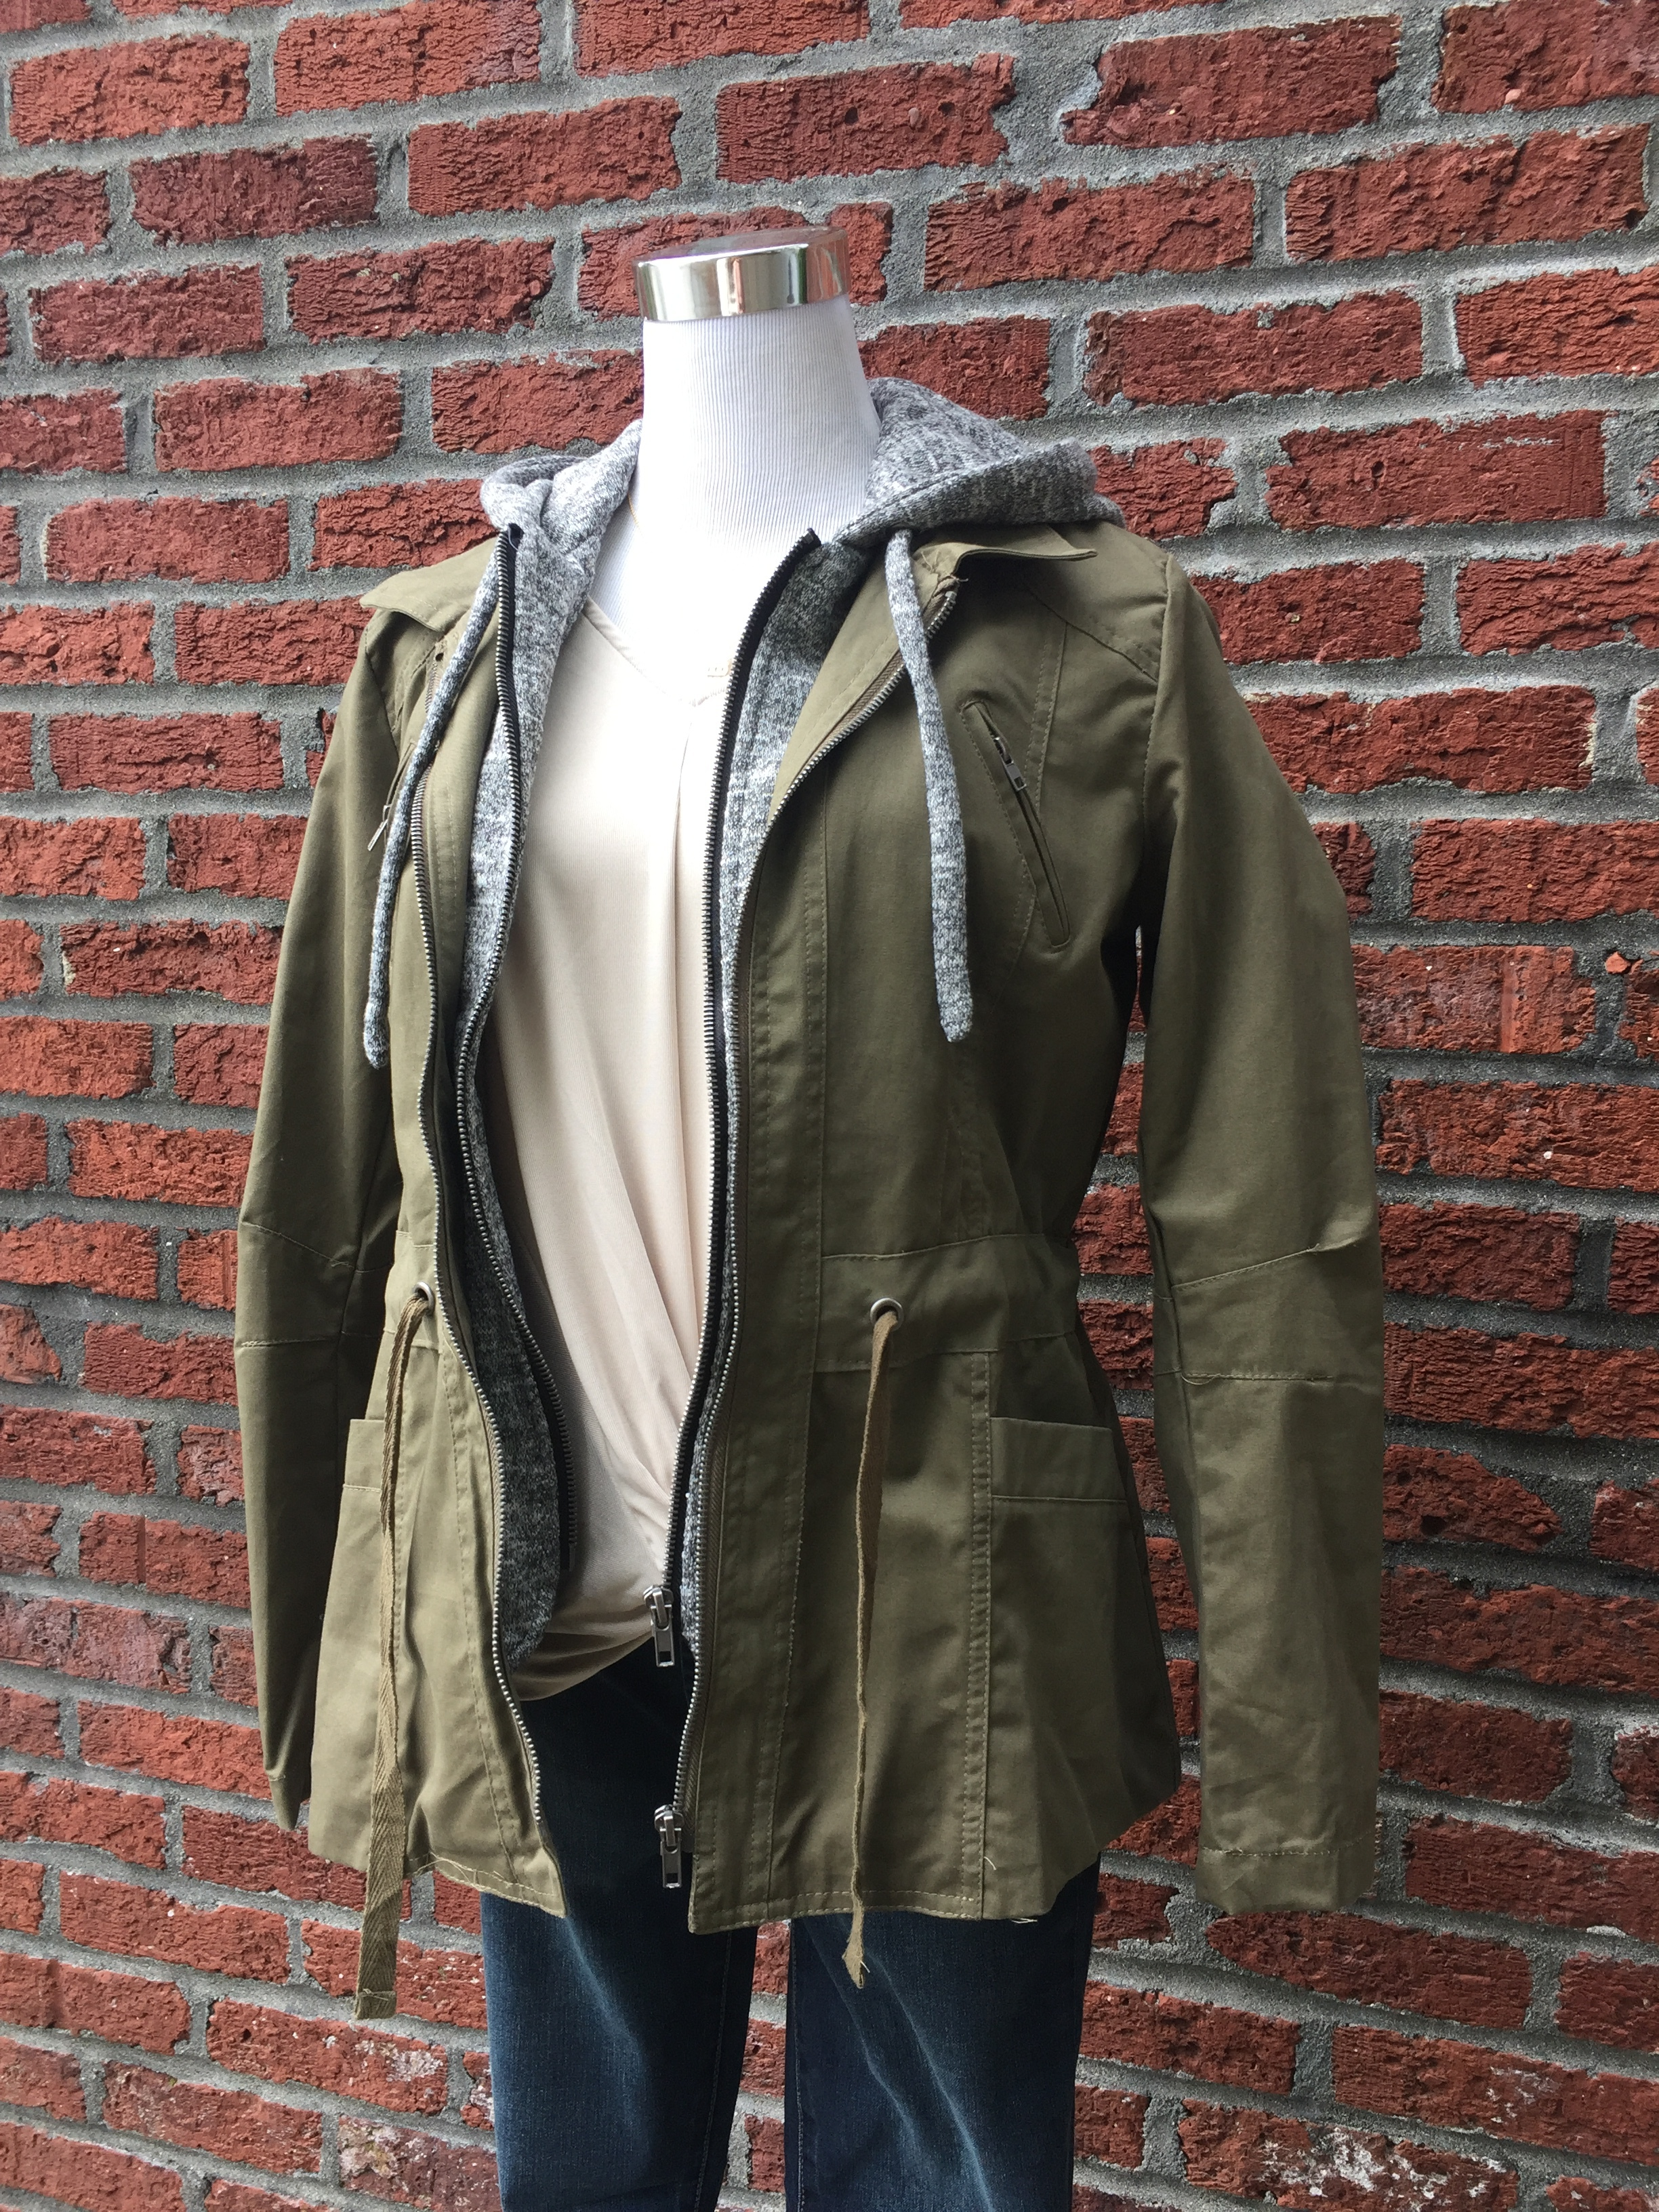 Layered Coat (Green and Mustard)